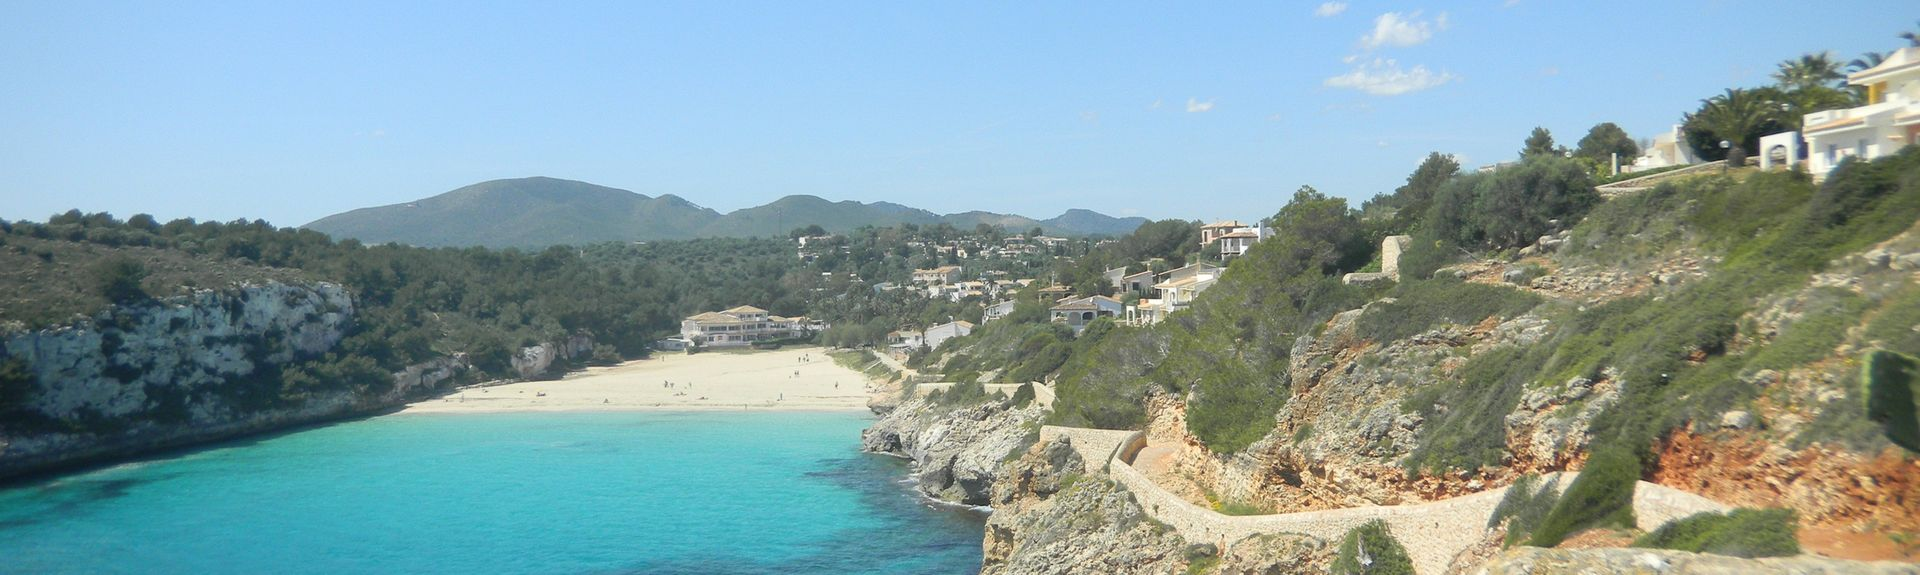 Cala Bona, Balearerna, Spanien